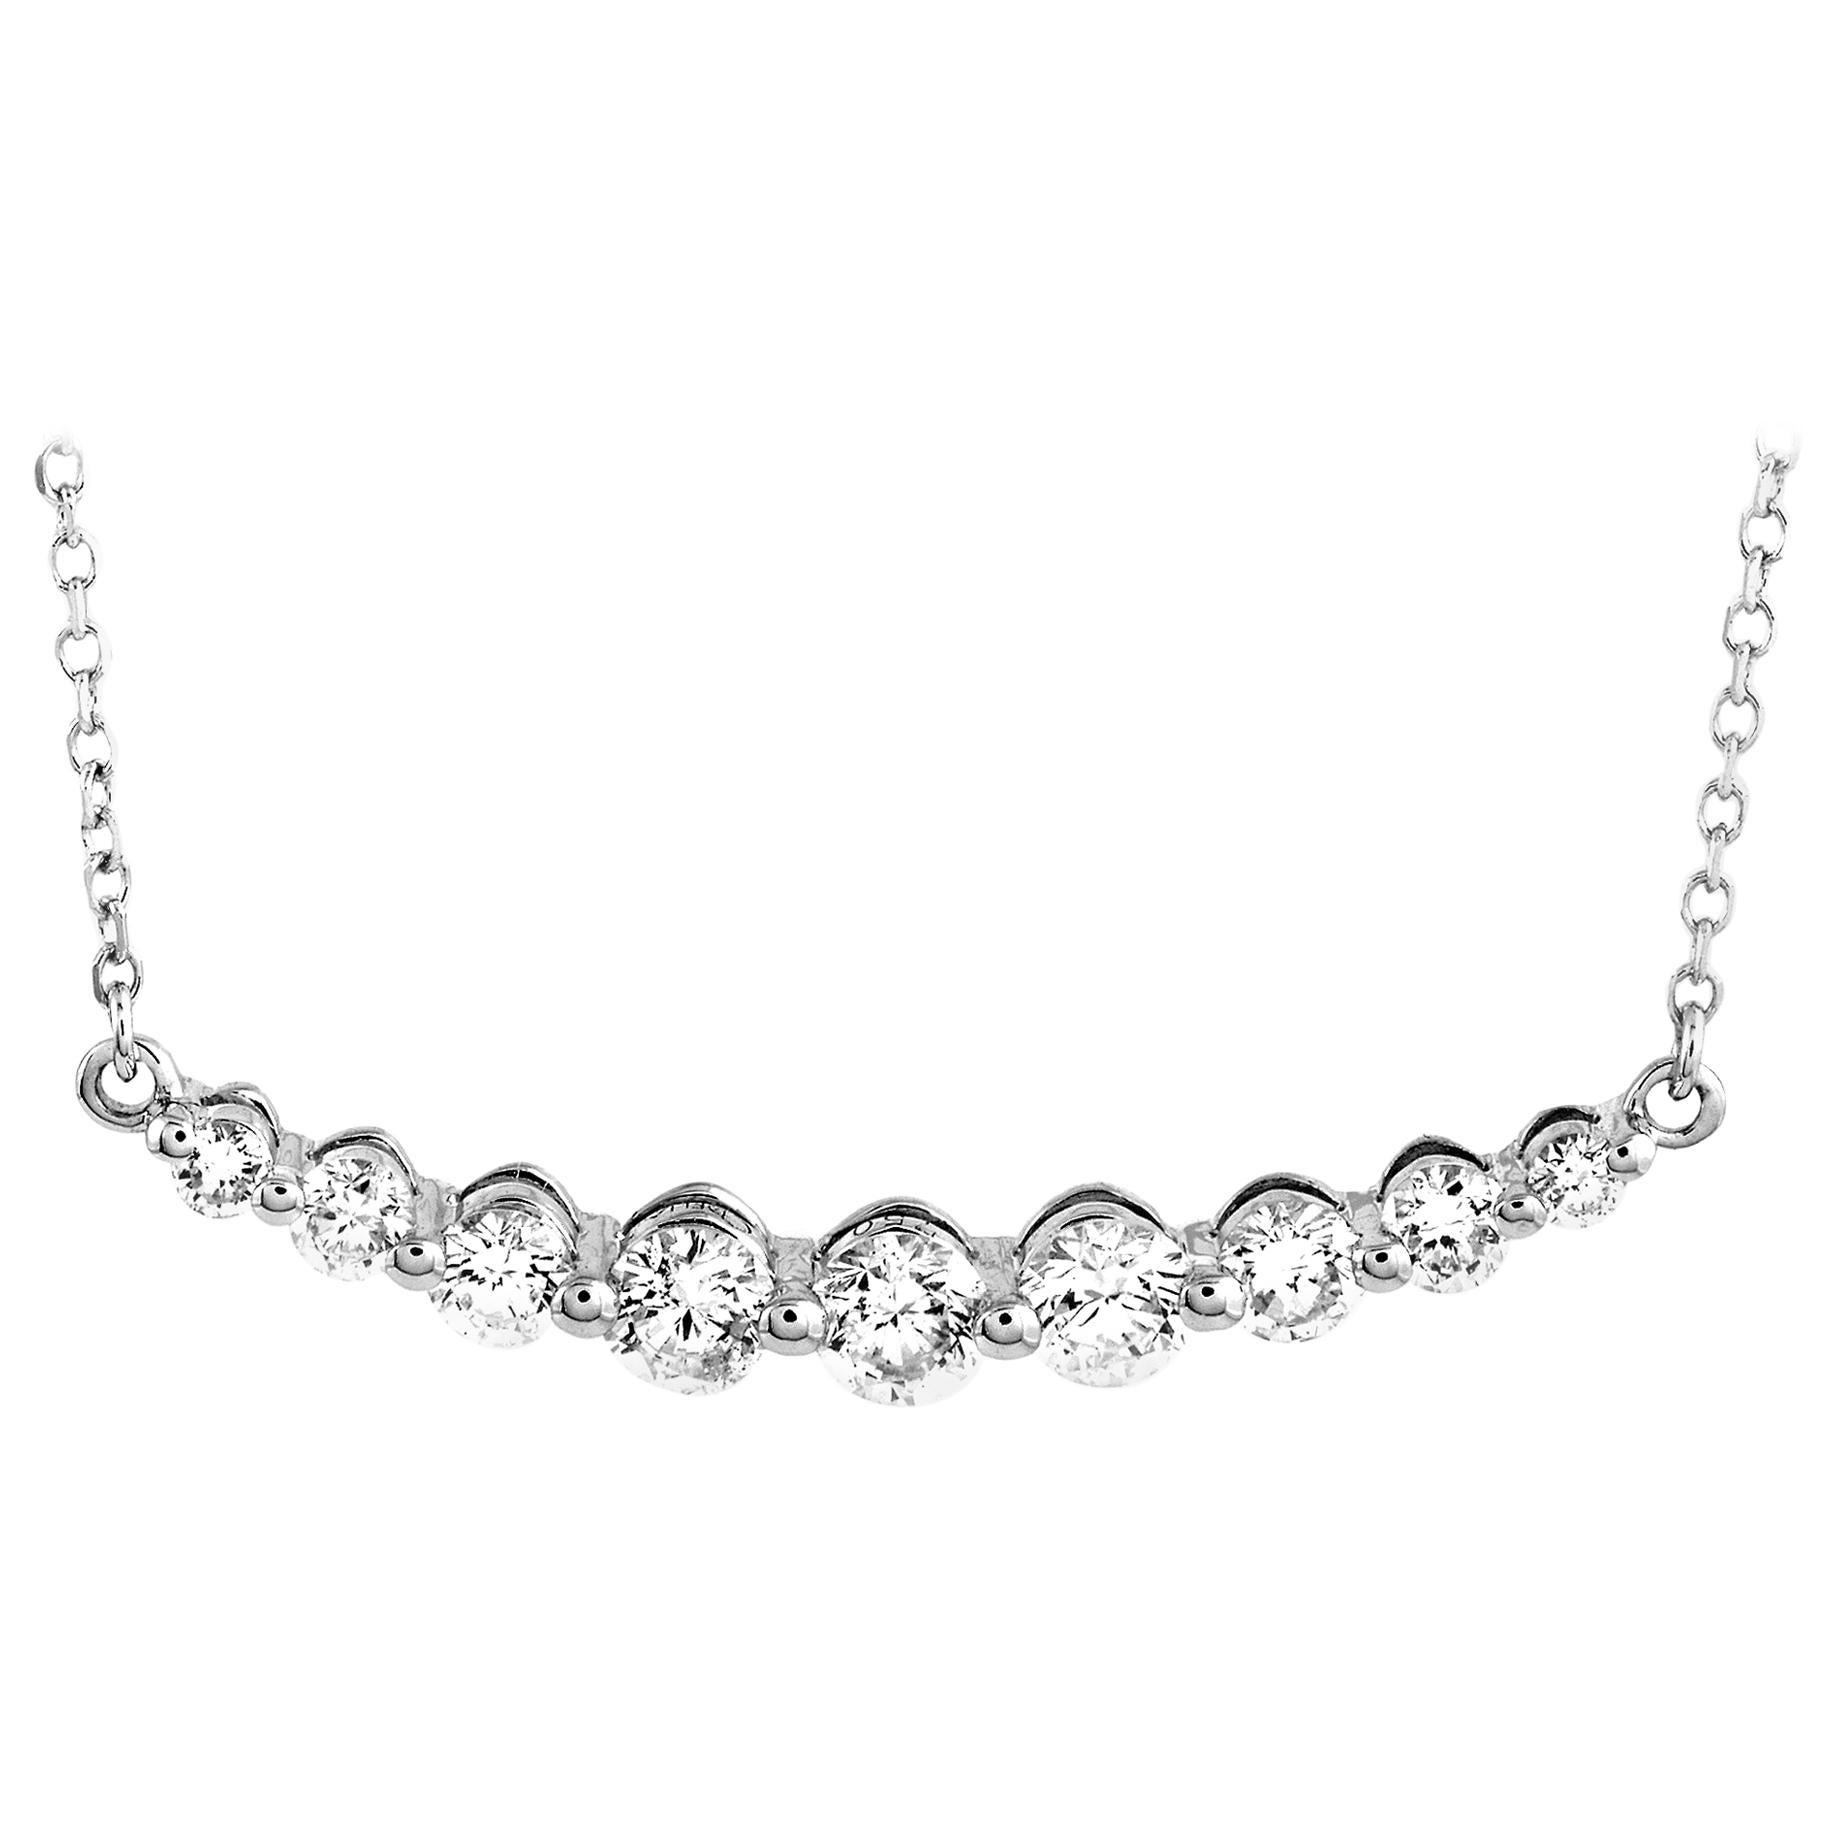 LB Exclusive 18 Karat White Gold 0.50 Carat Diamond Pendant Necklace